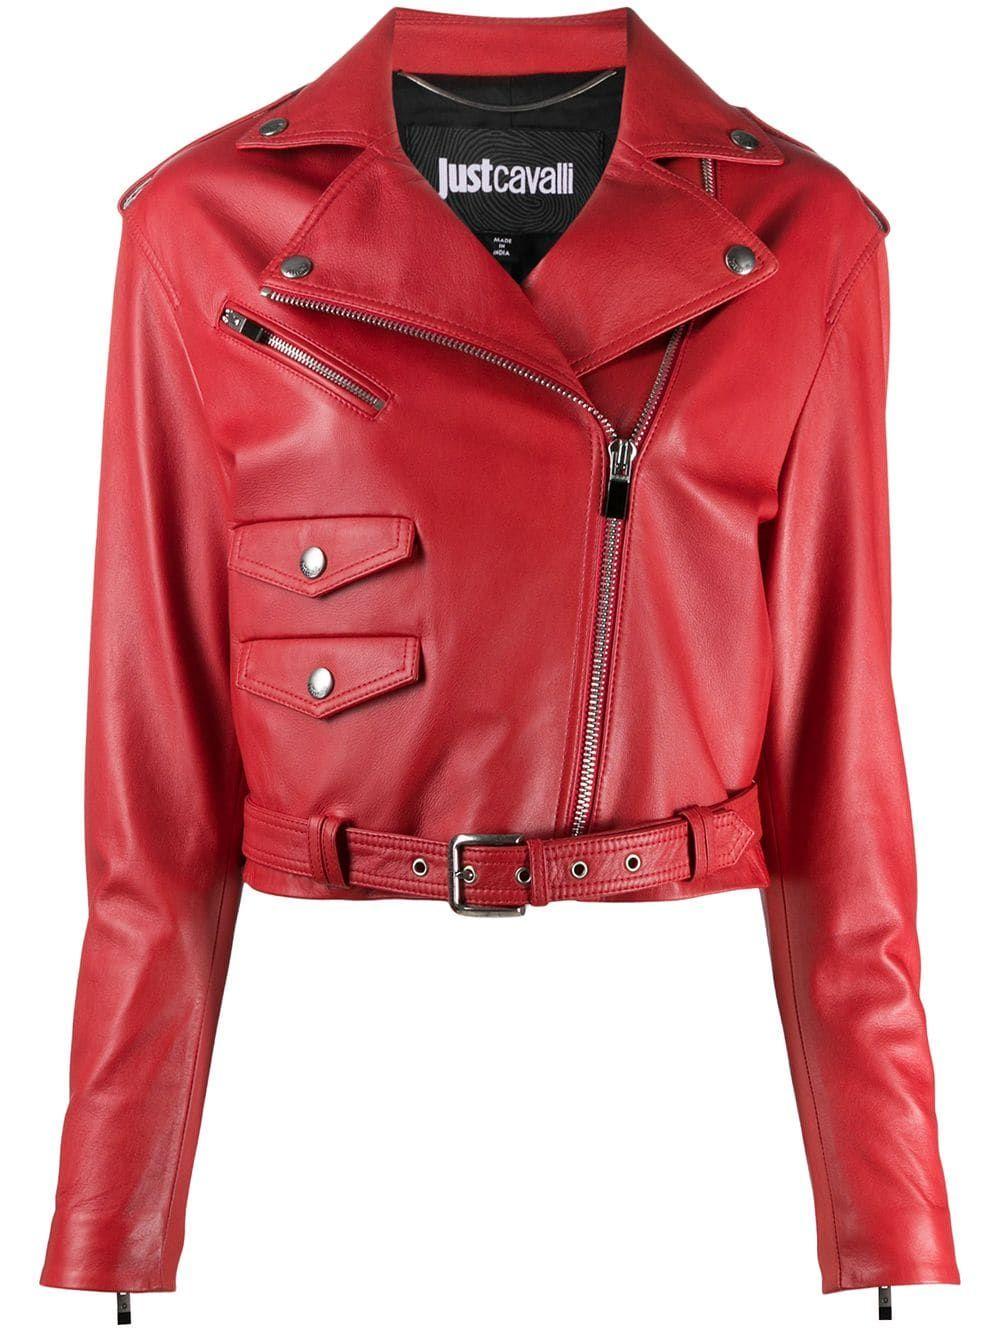 Just Cavalli Cropped Biker Jacket Farfetch In 2021 Red Leather Jacket Outfit Cropped Biker Jacket Jackets [ 1334 x 1000 Pixel ]